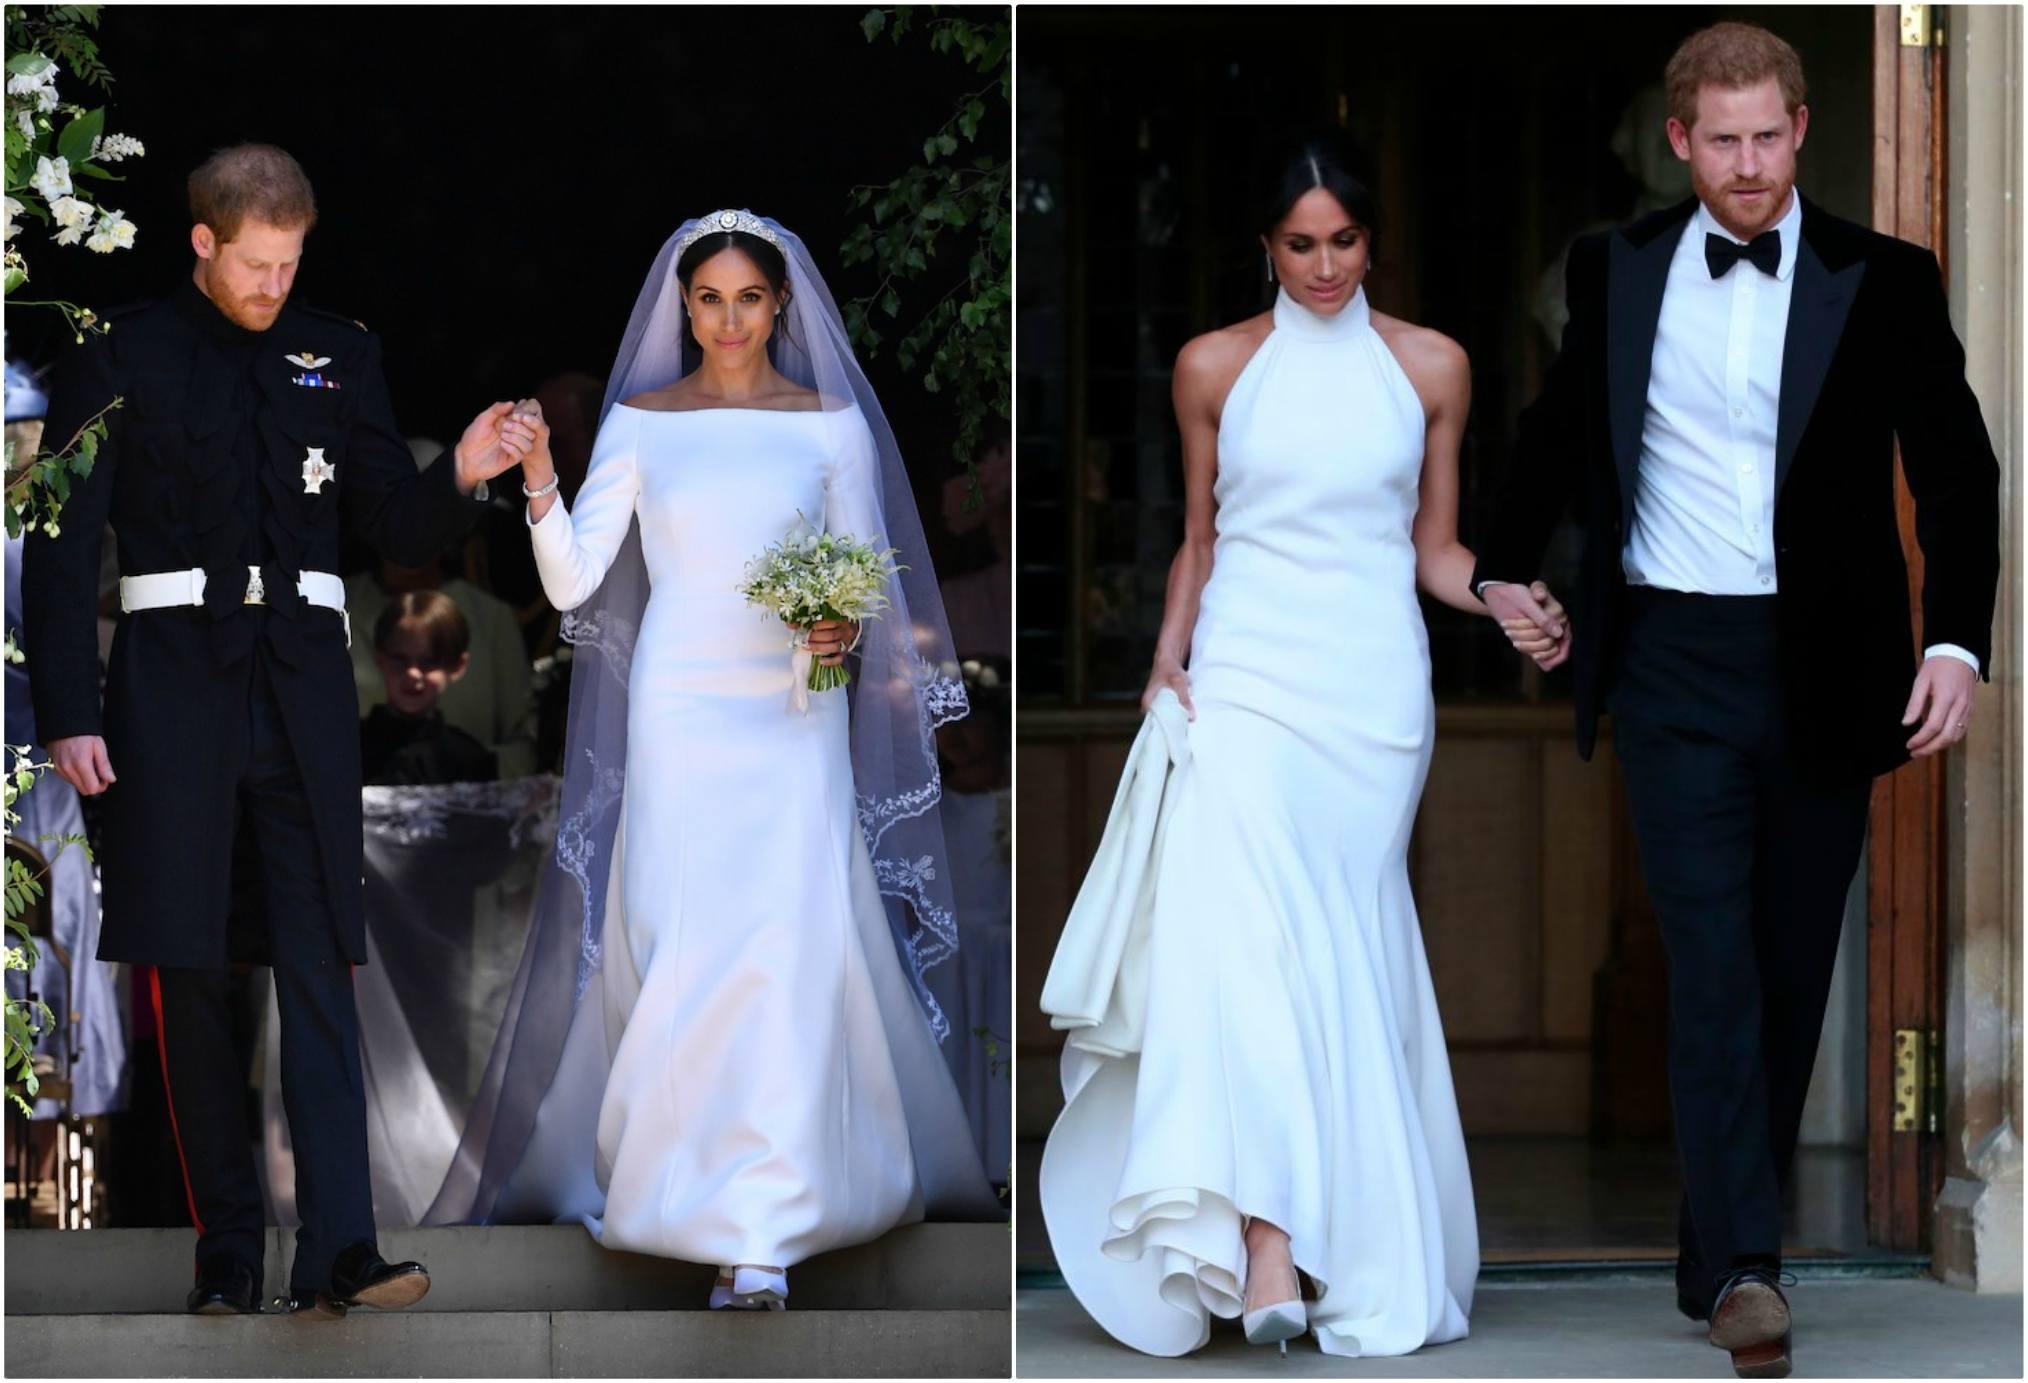 Meghan Markle Two dresses